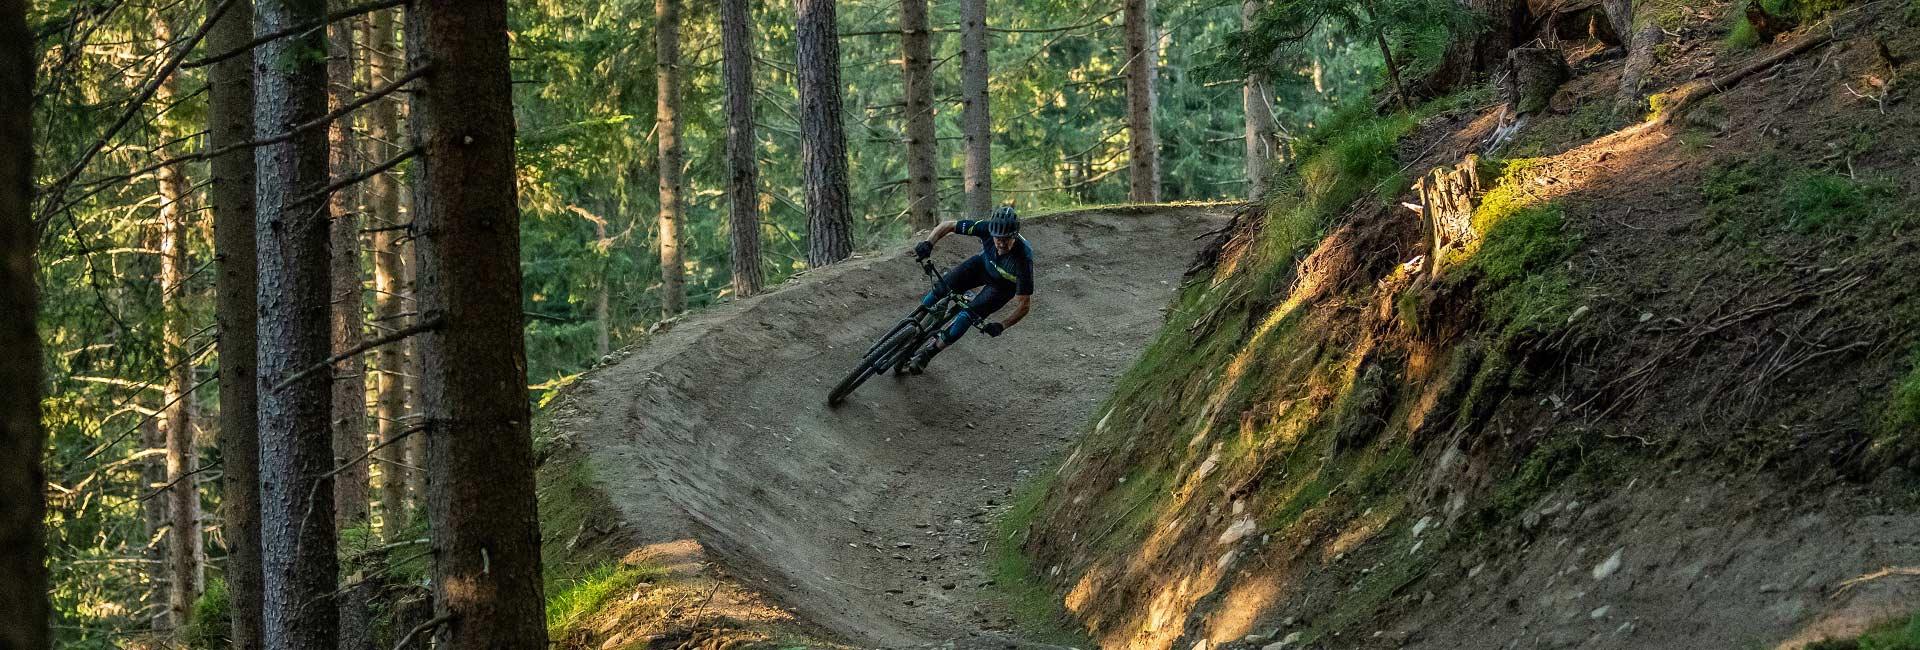 mtb flow trails in Val Gardena - plan de gralba